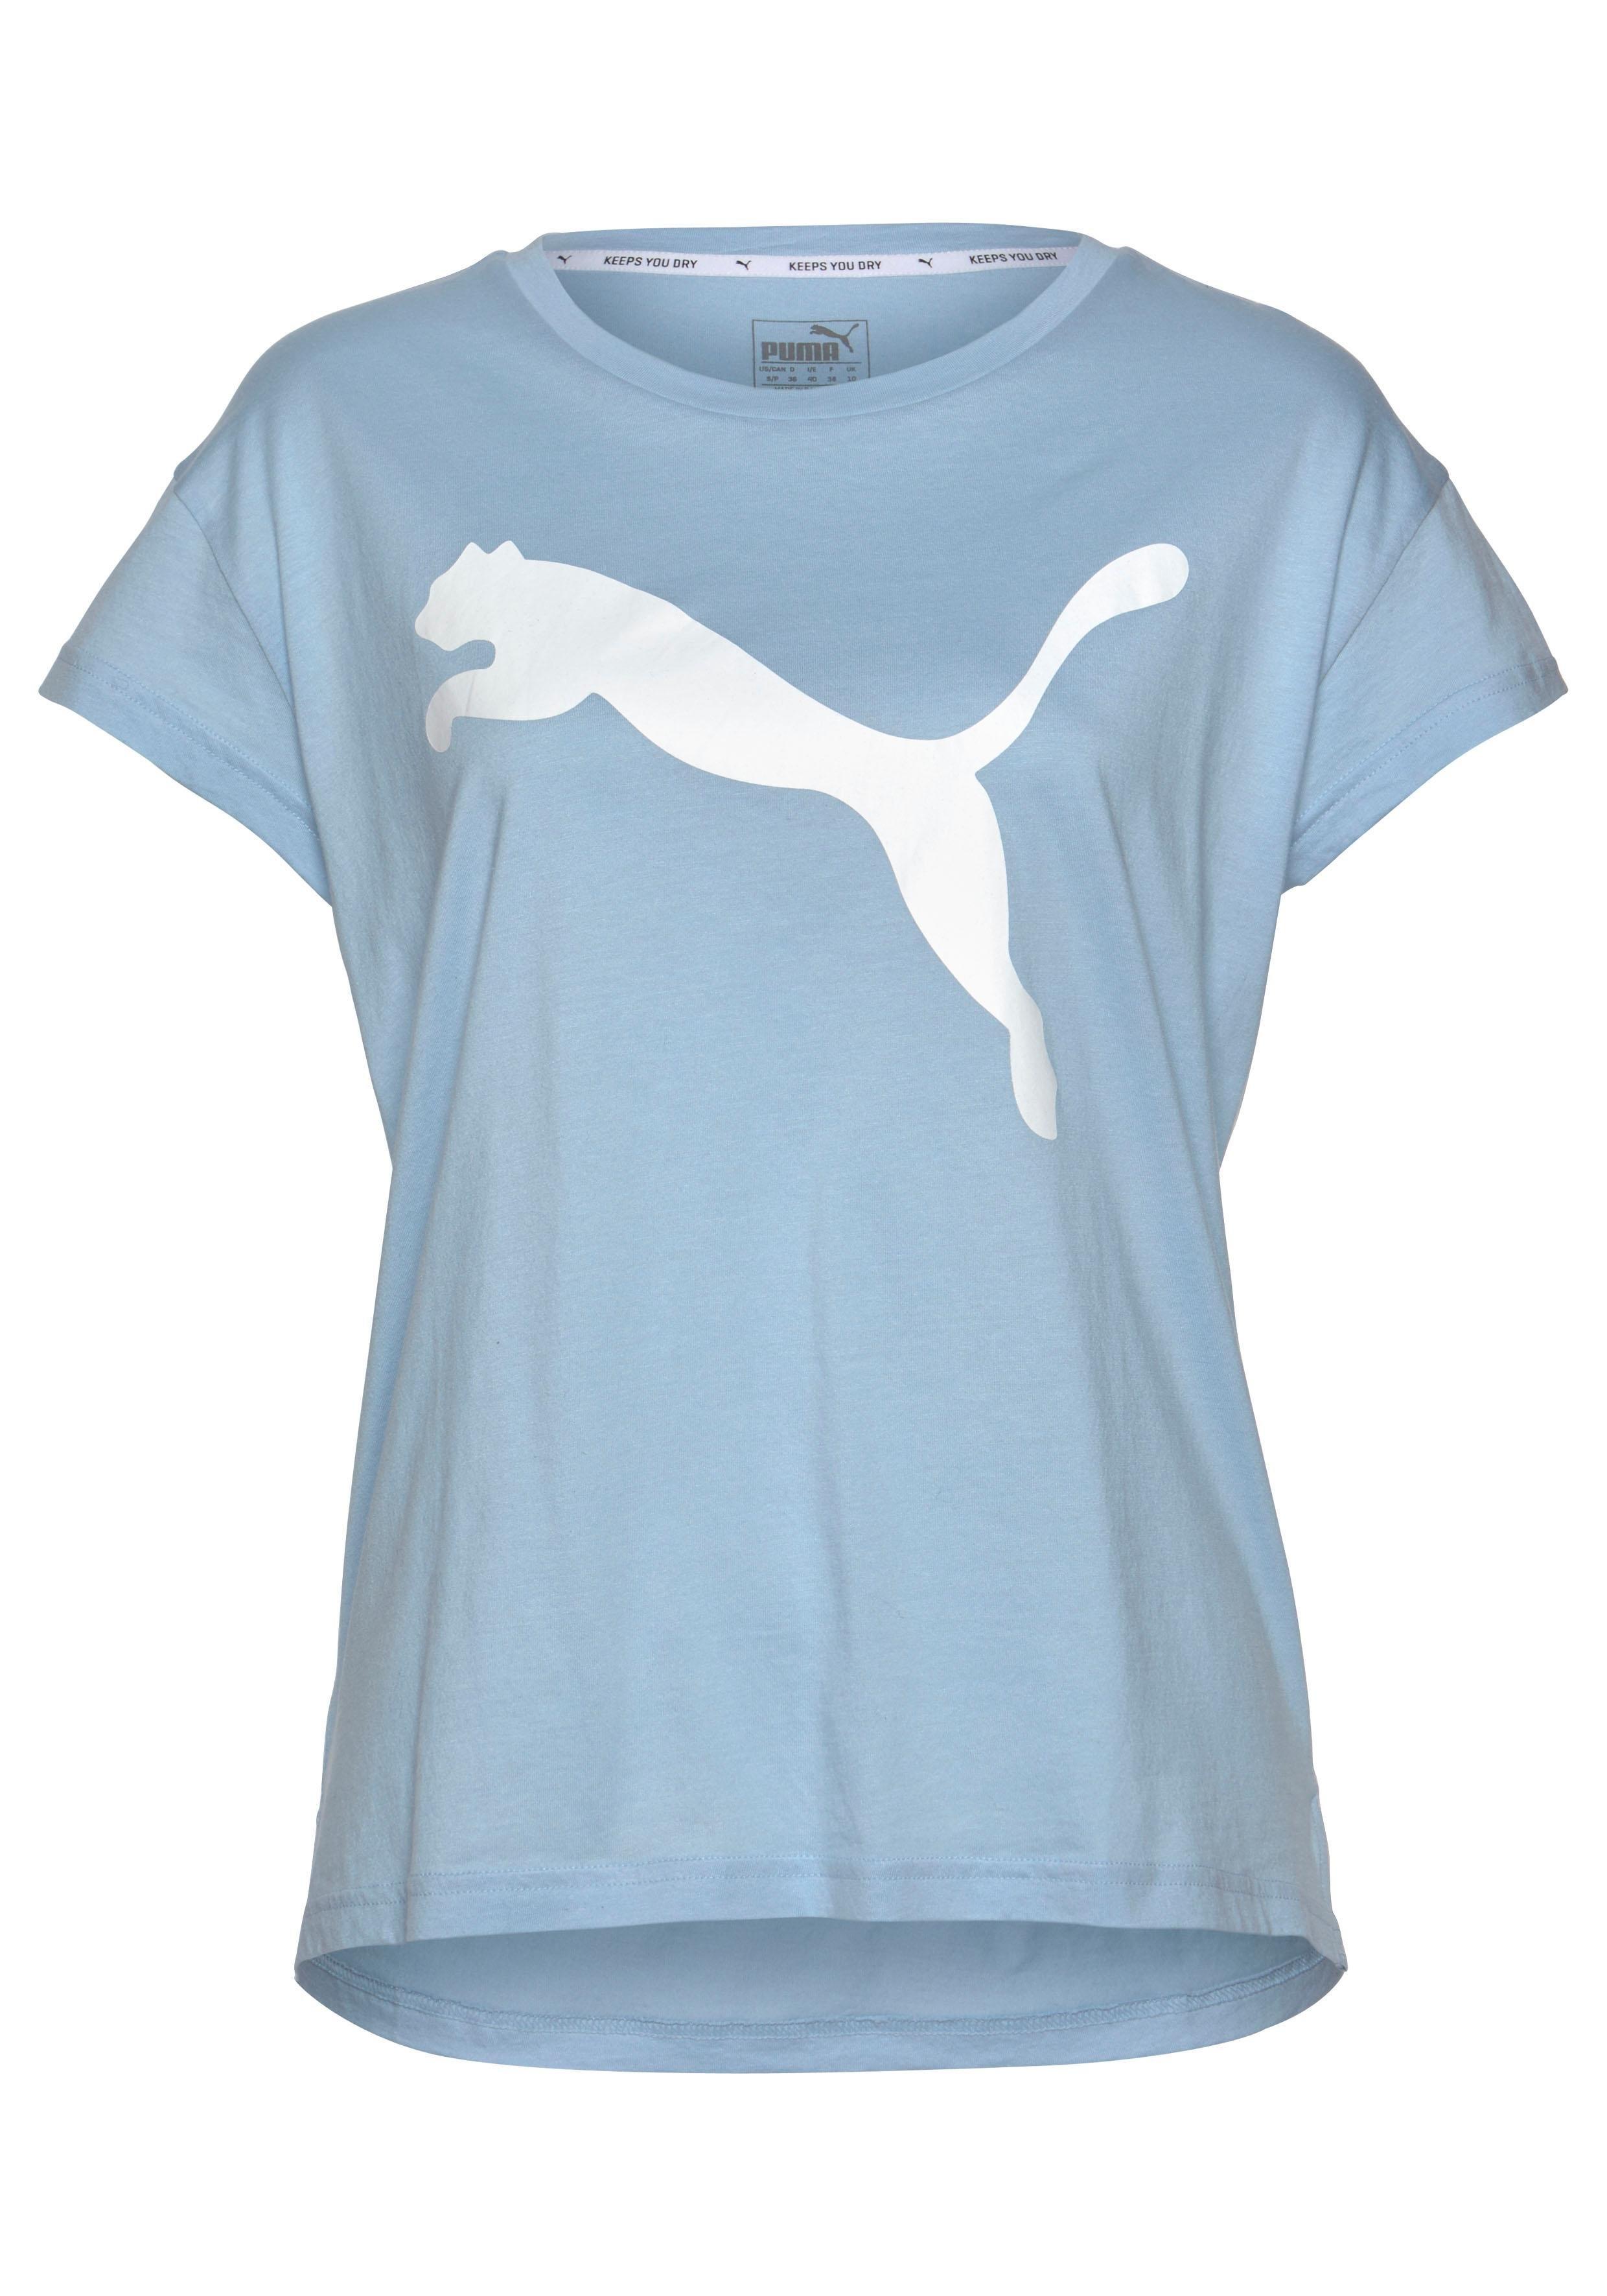 Online Tee Shirtelevated Ess Puma Logo Kopen Functioneel vN8mOwyn0